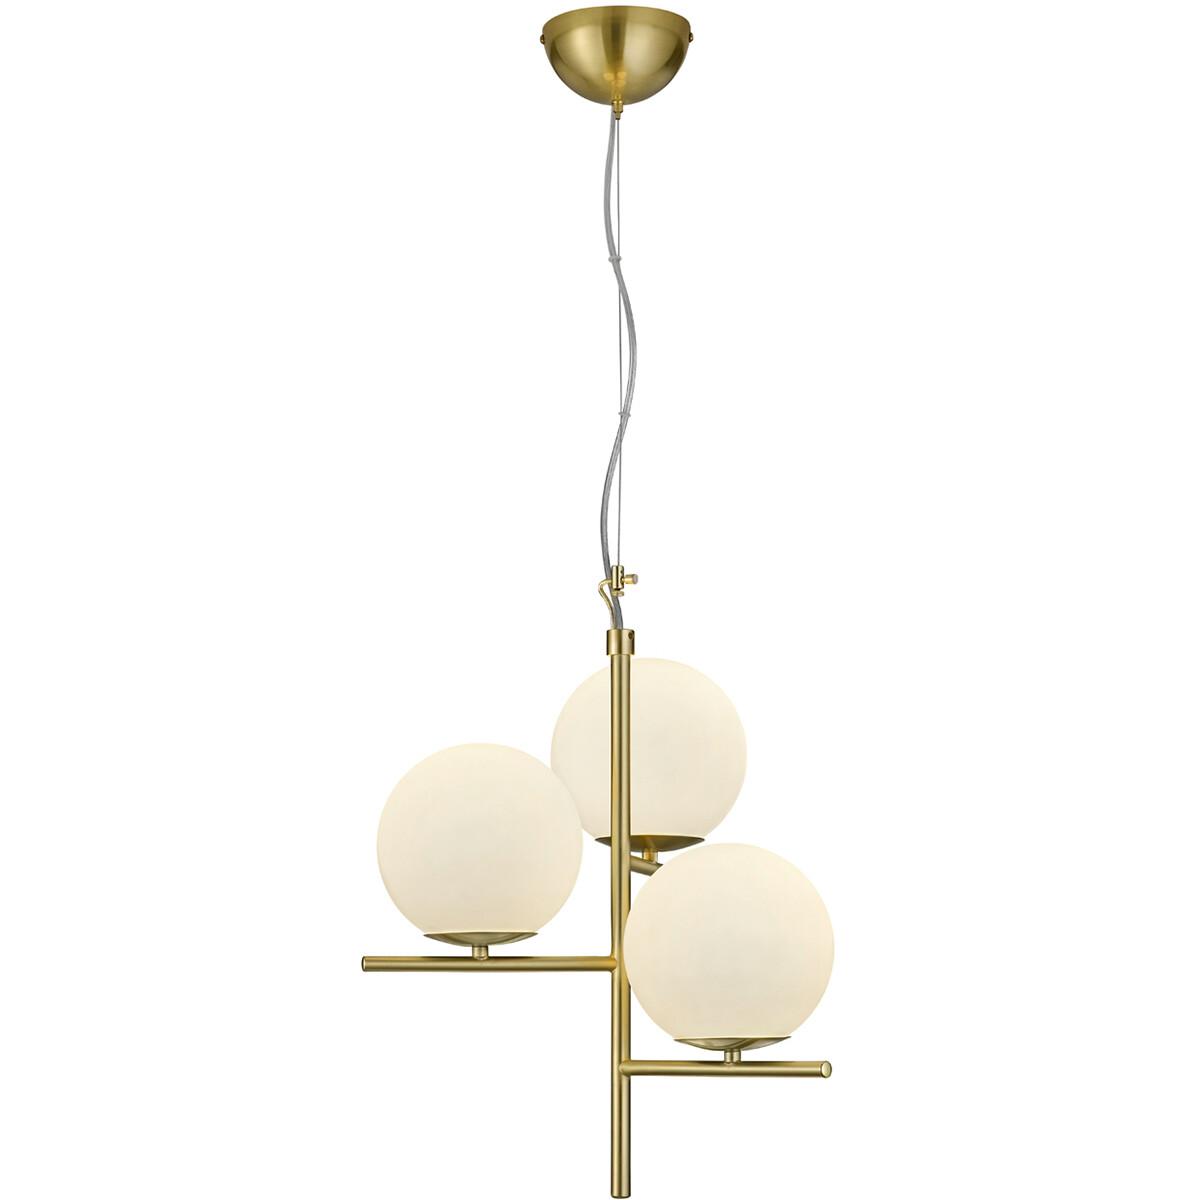 LED Hanglamp - Hangverlichting - Trion Pora - E14 Fitting - Rond - Mat Goud - Aluminium